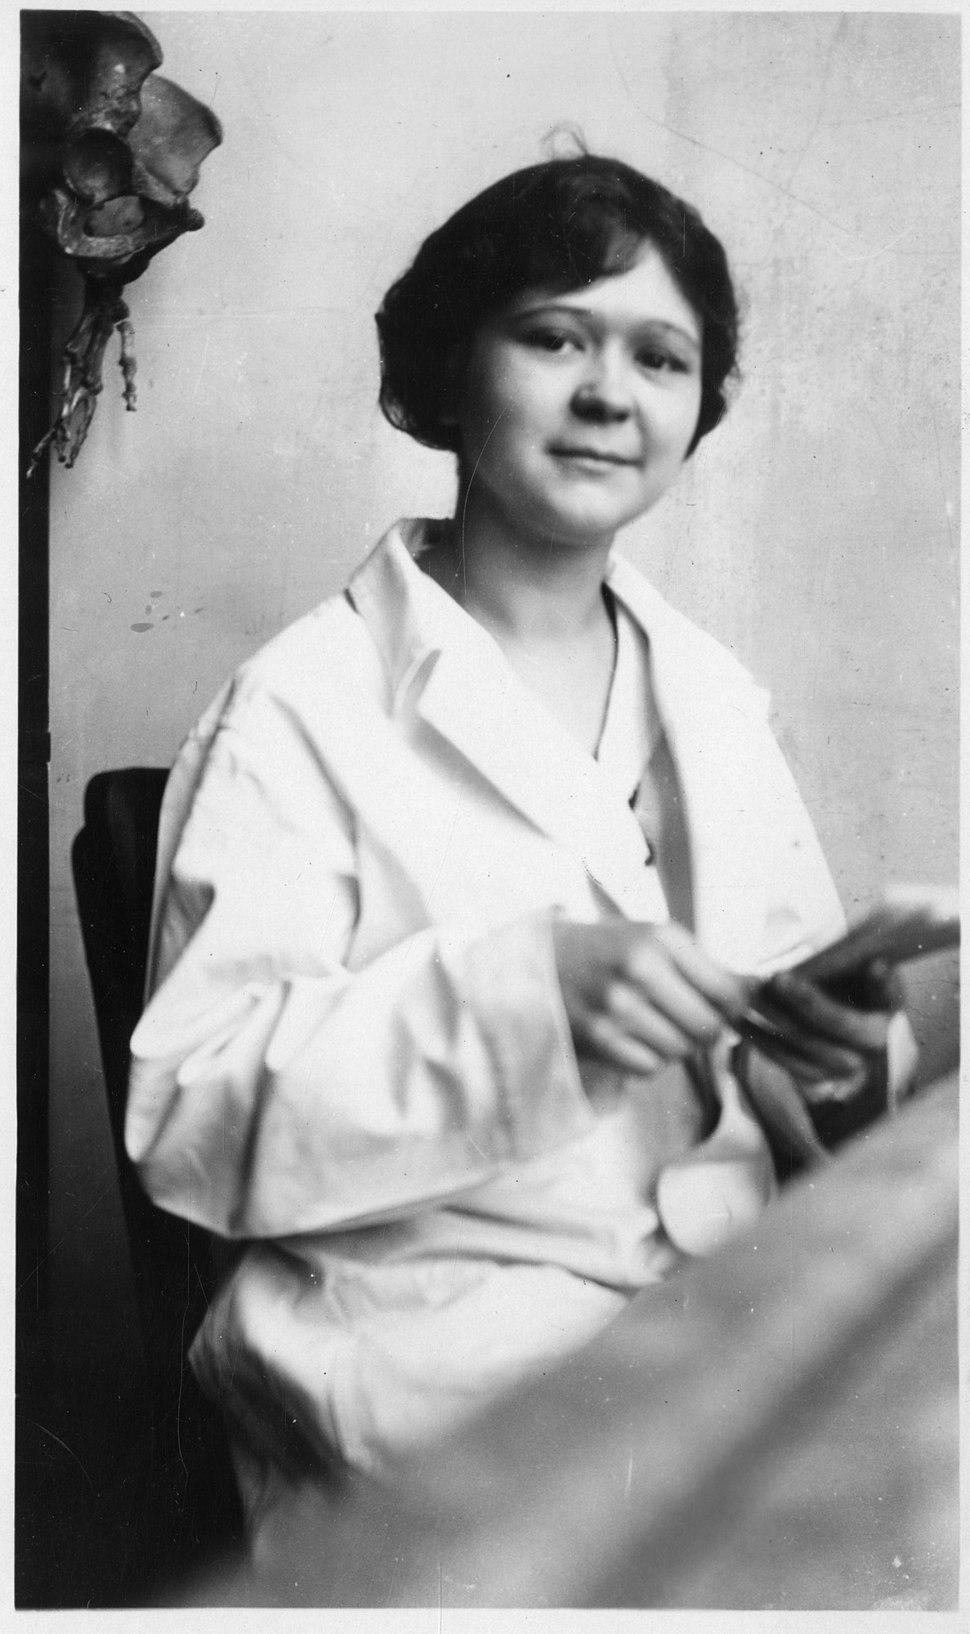 Mildred Trotter (1899-1991)